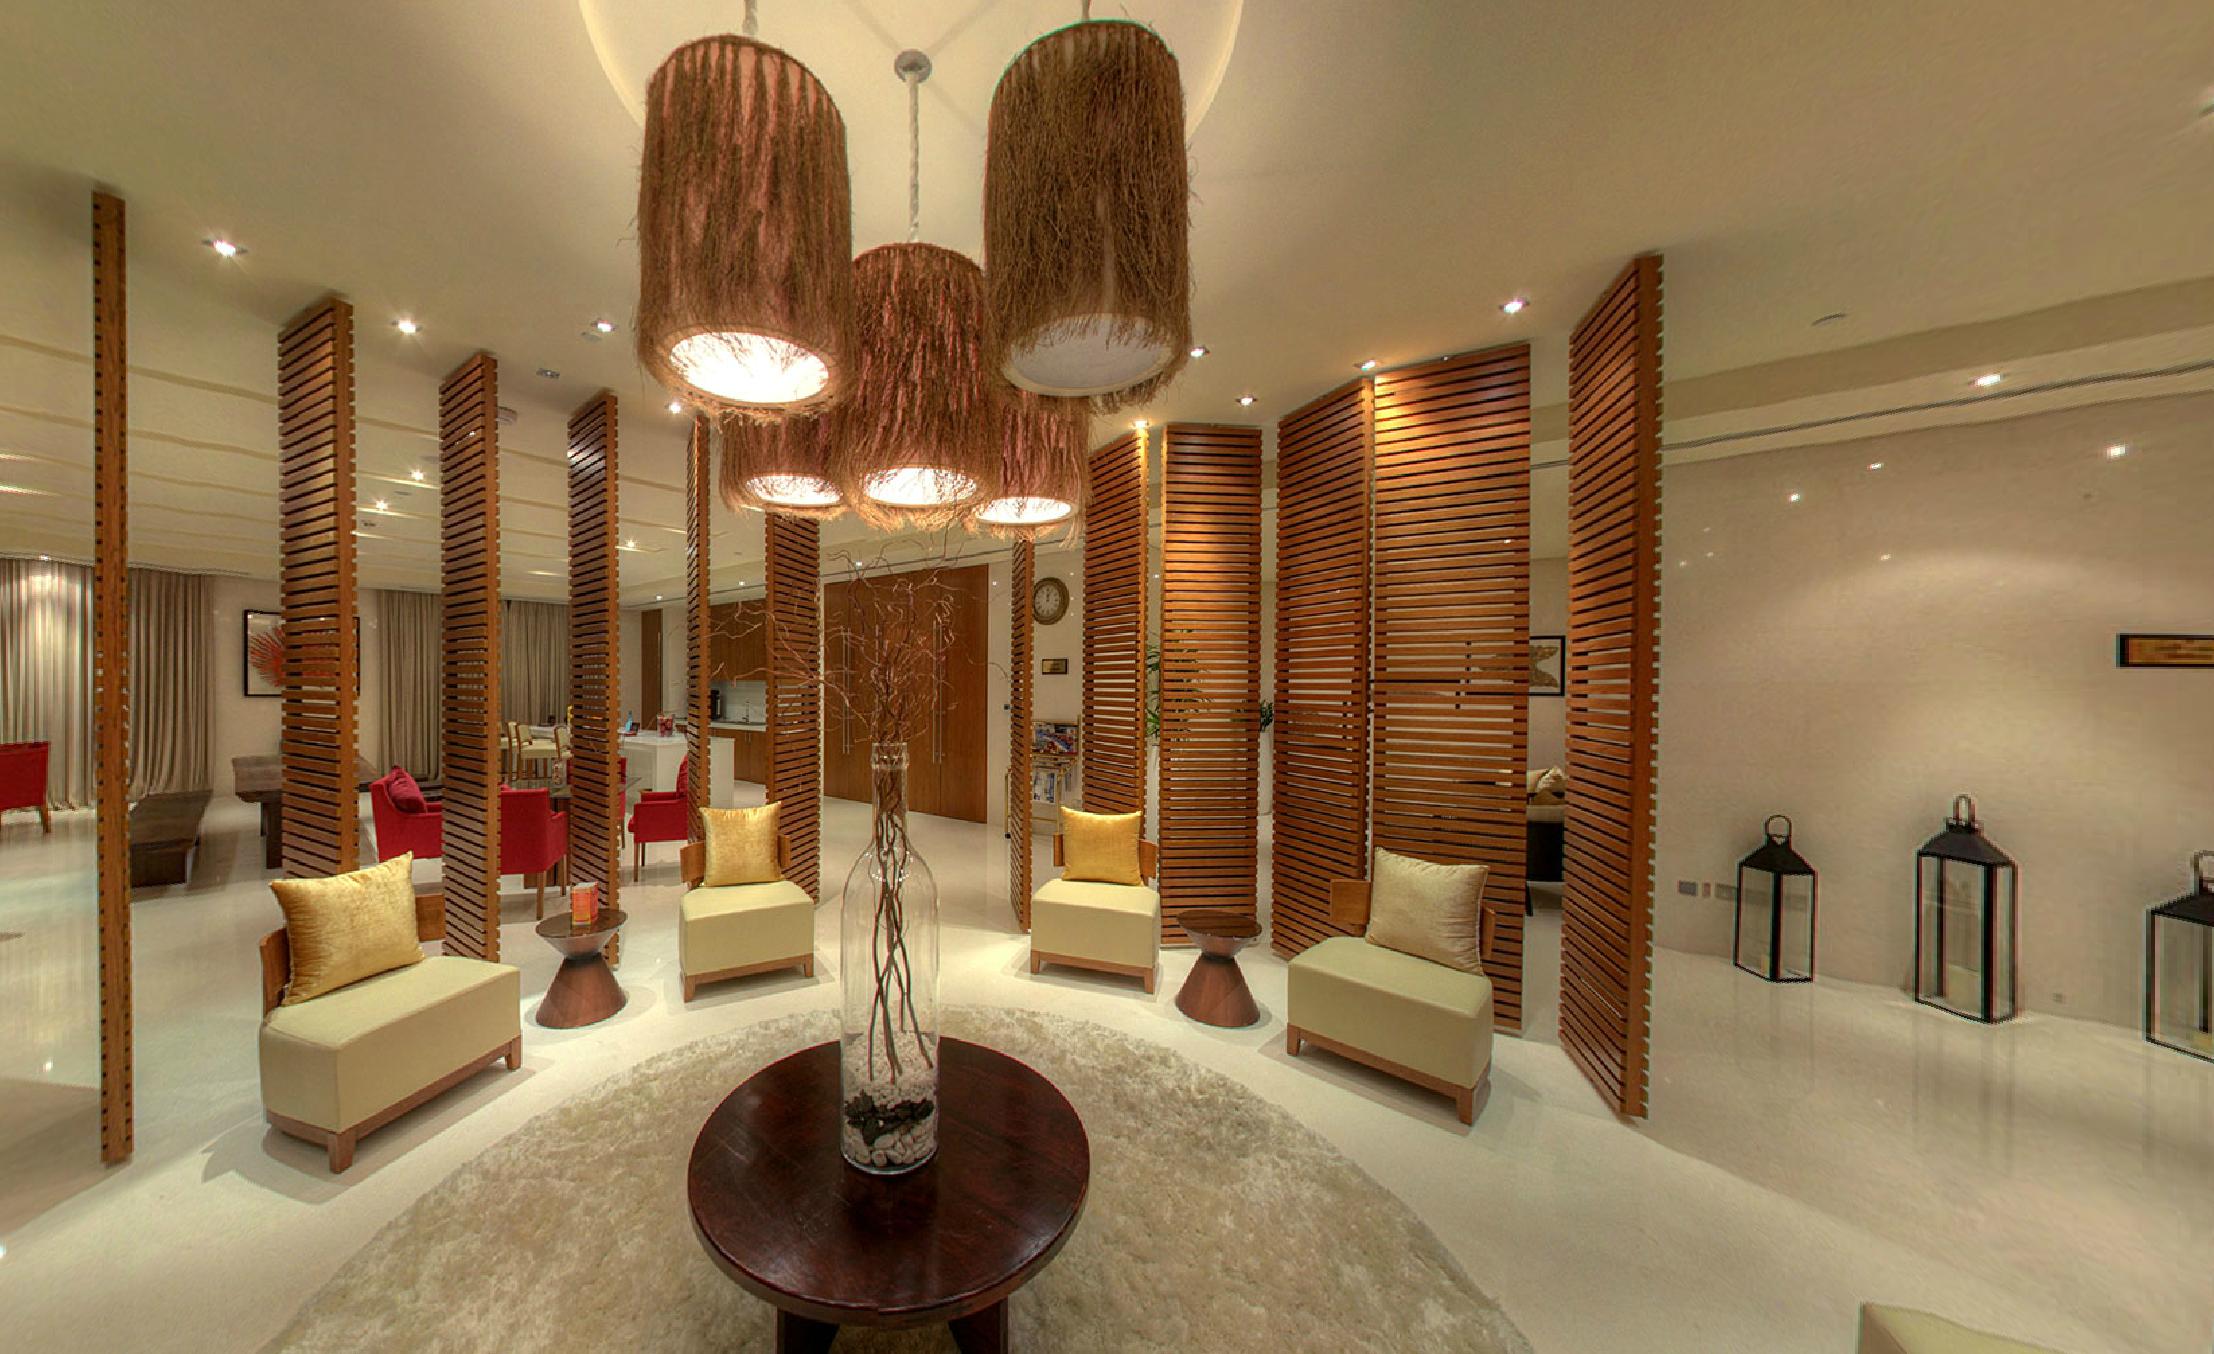 Rixos Palm Dubai Spa Aquatonic Home Decor Decor Room